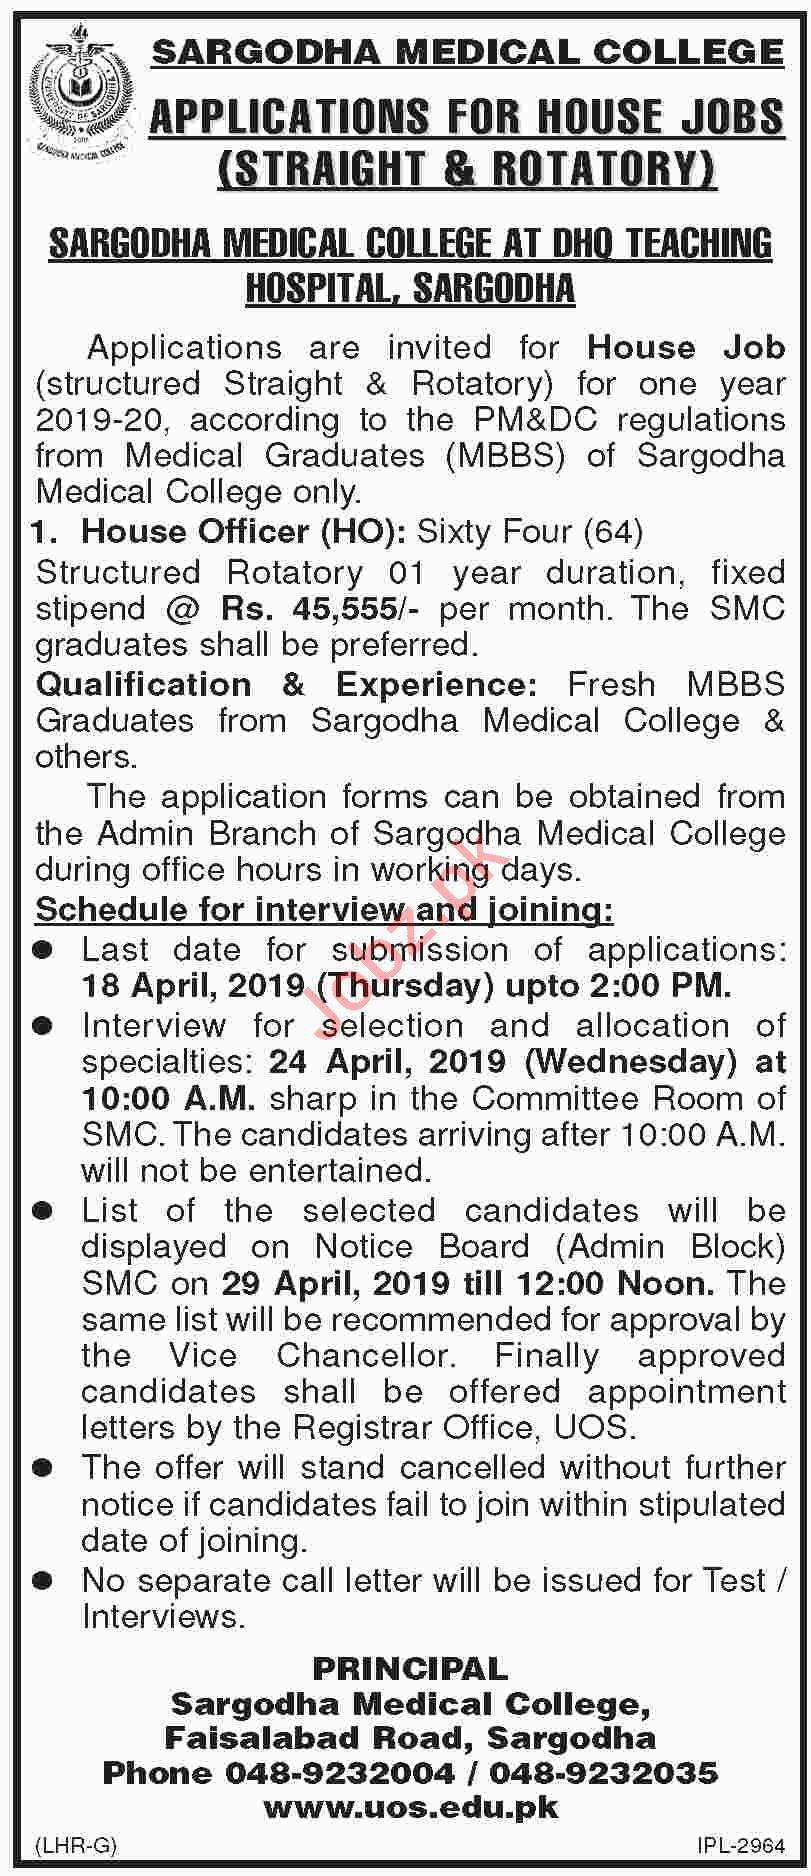 DHQ Teaching Hospital Sargodha House Jobs 2019